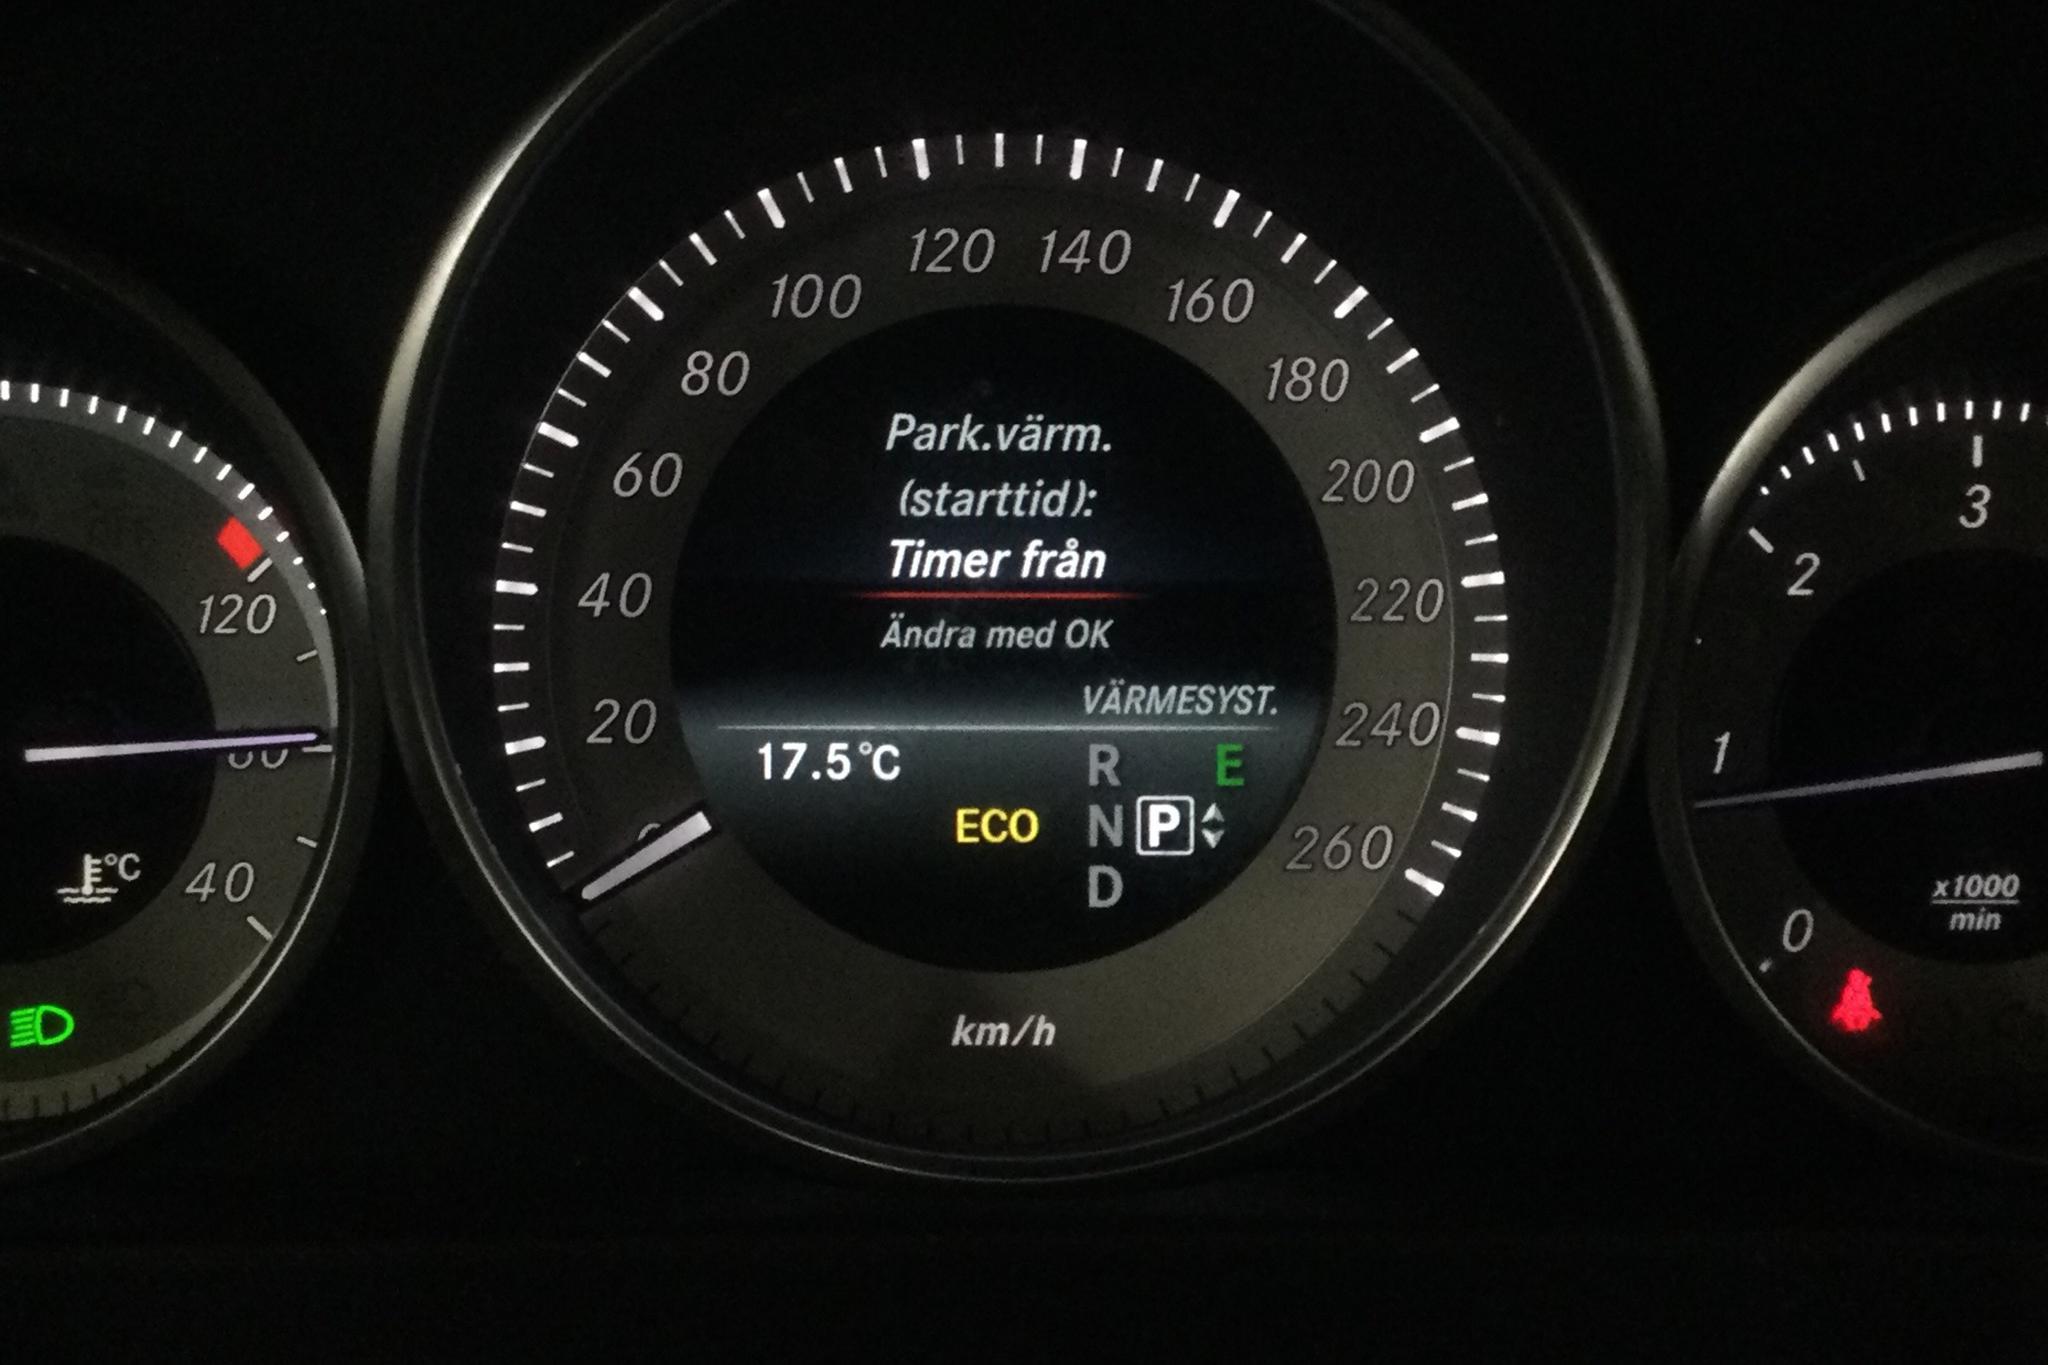 Mercedes E 220 BlueTEC Kombi 4MATIC S212 (170hk) - 319 590 km - Automatic - white - 2016